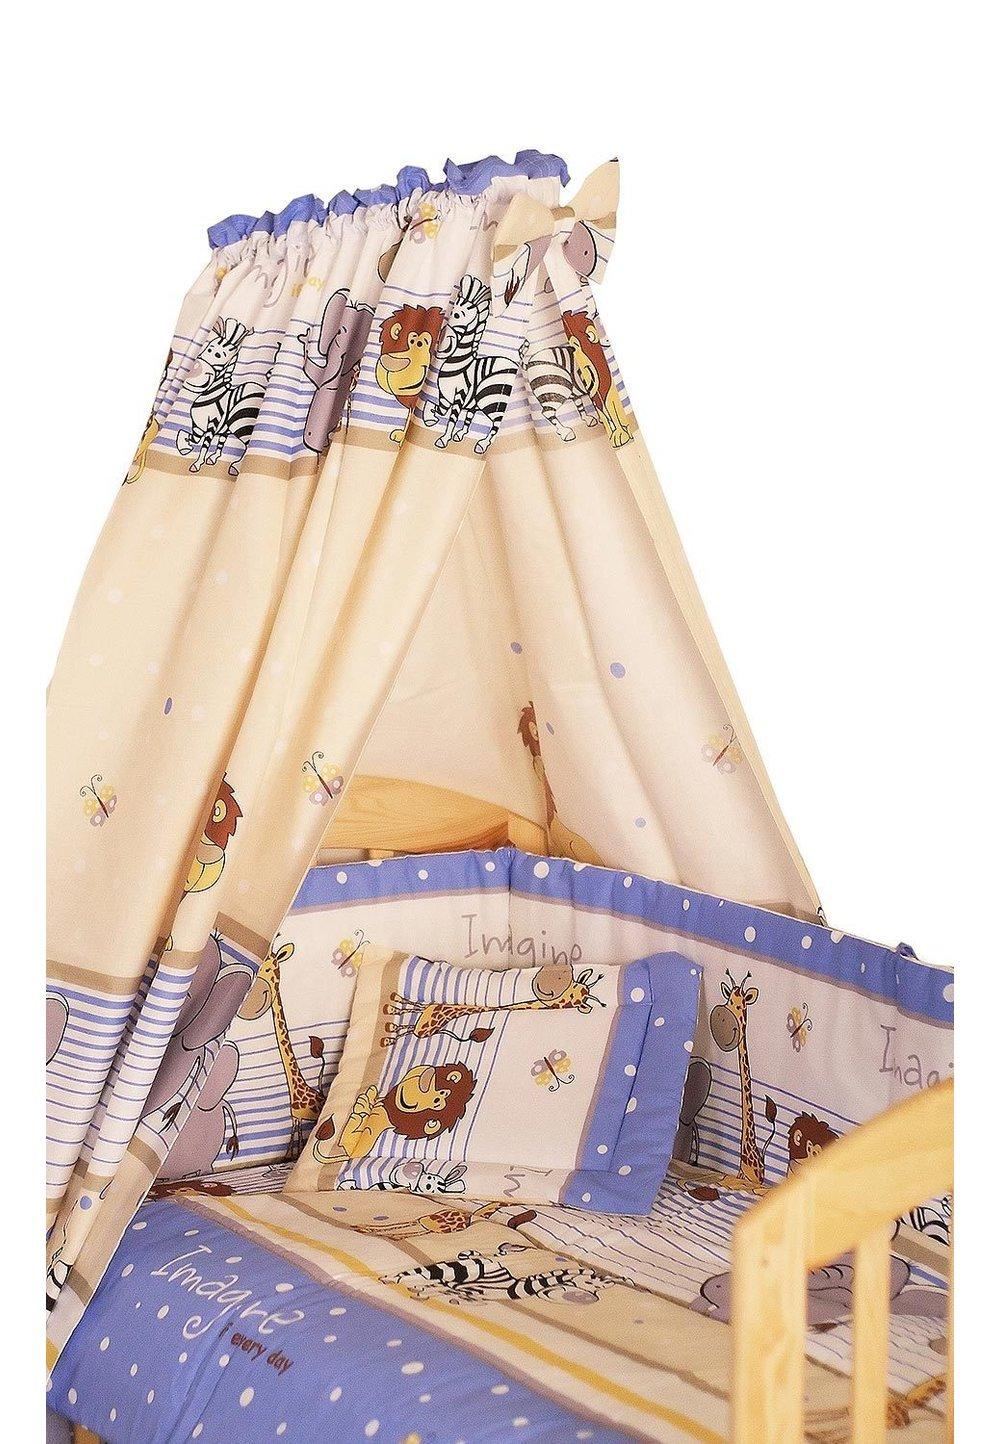 Lenjerie cu baldachin, 6 piese, Safari albastru, 120x60cm imagine